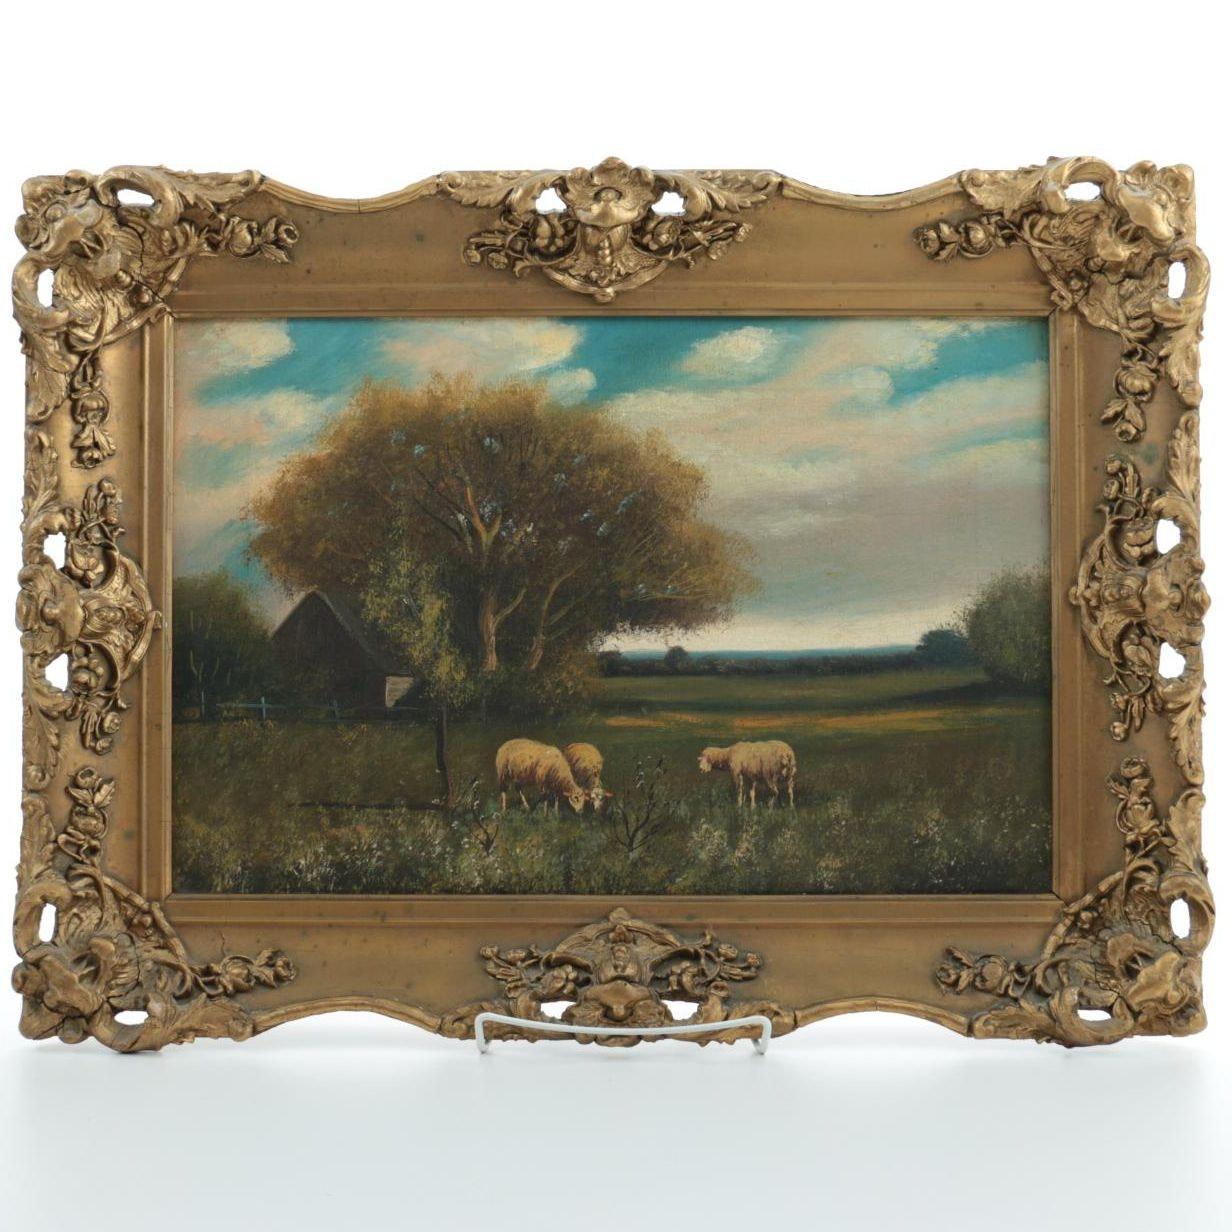 Original Oil Painting on Canvas of Pastoral Scene